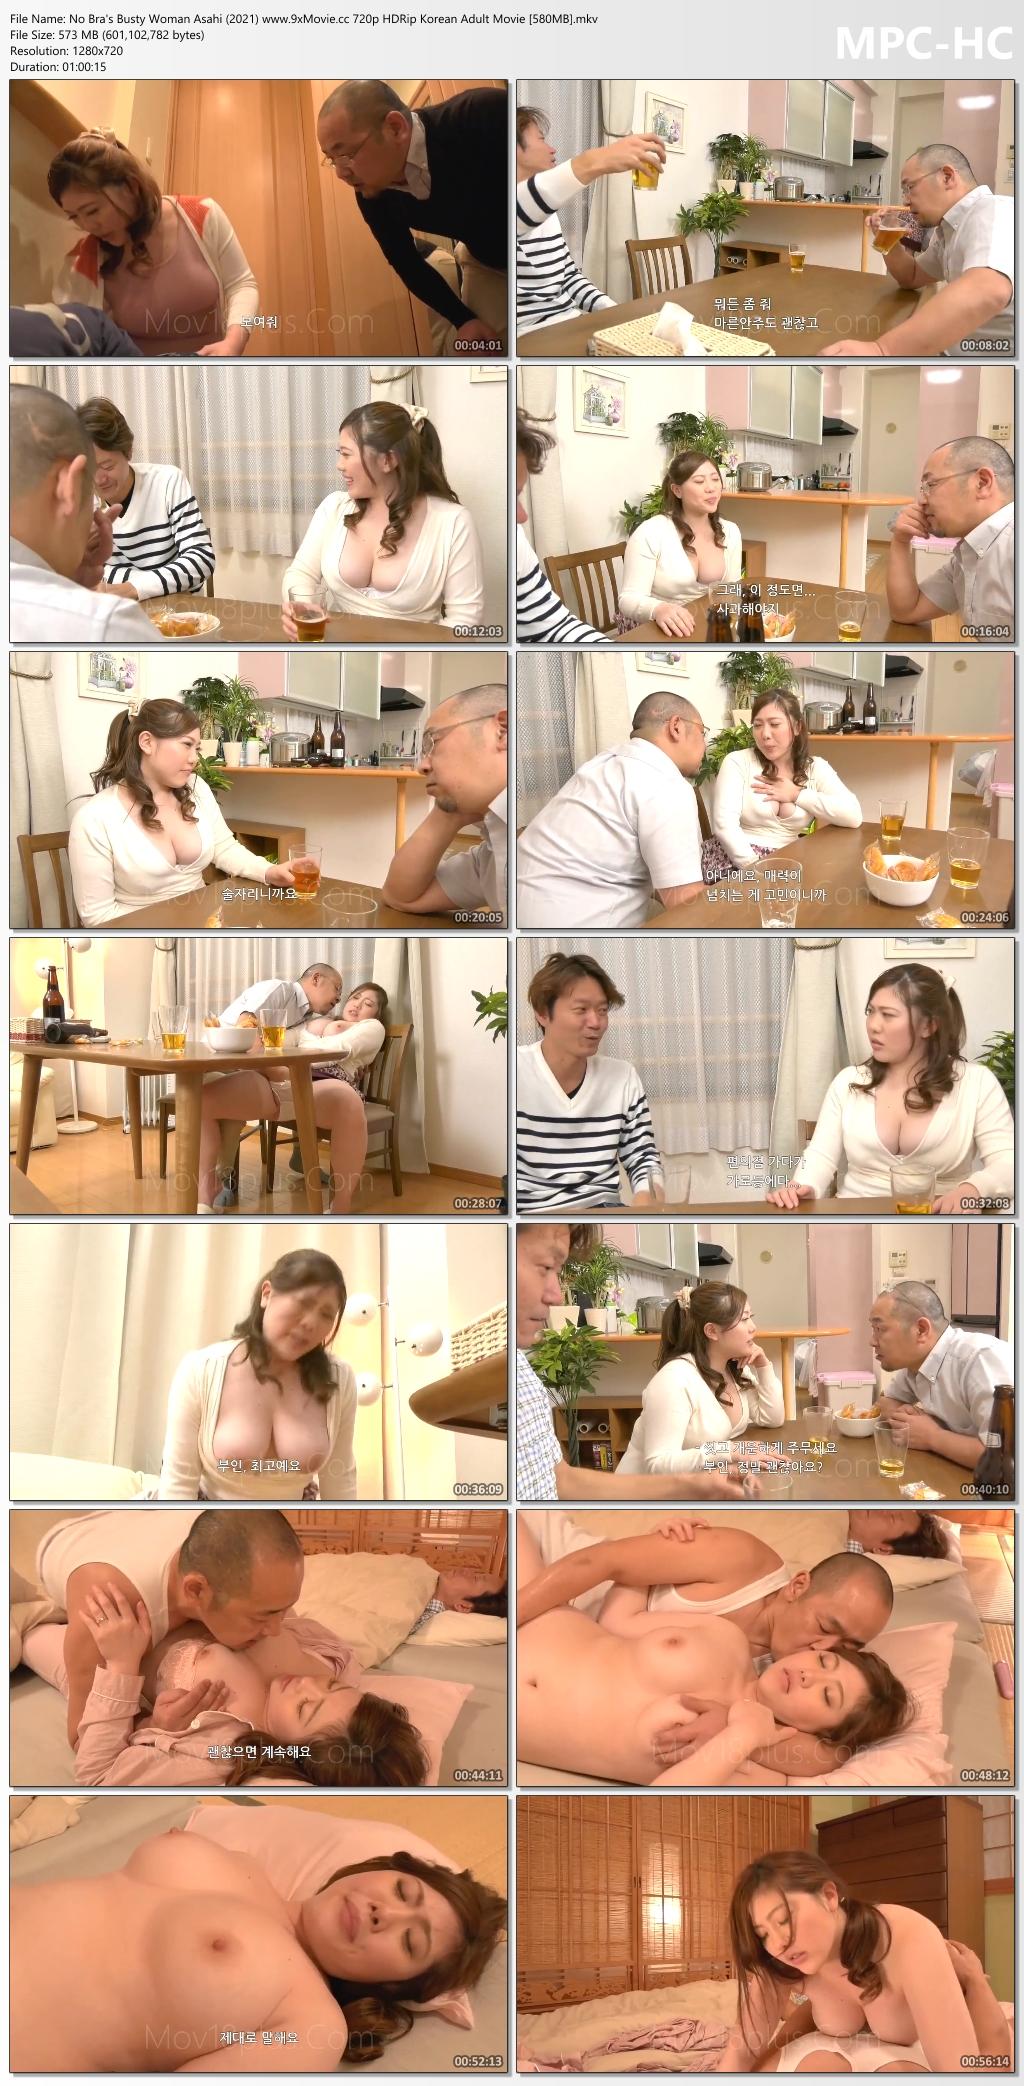 No-Bra-s-Busty-Woman-Asahi-2021-www-9x-Movie-cc-720p-HDRip-Korean-Adult-Movie-580-MB-mkv